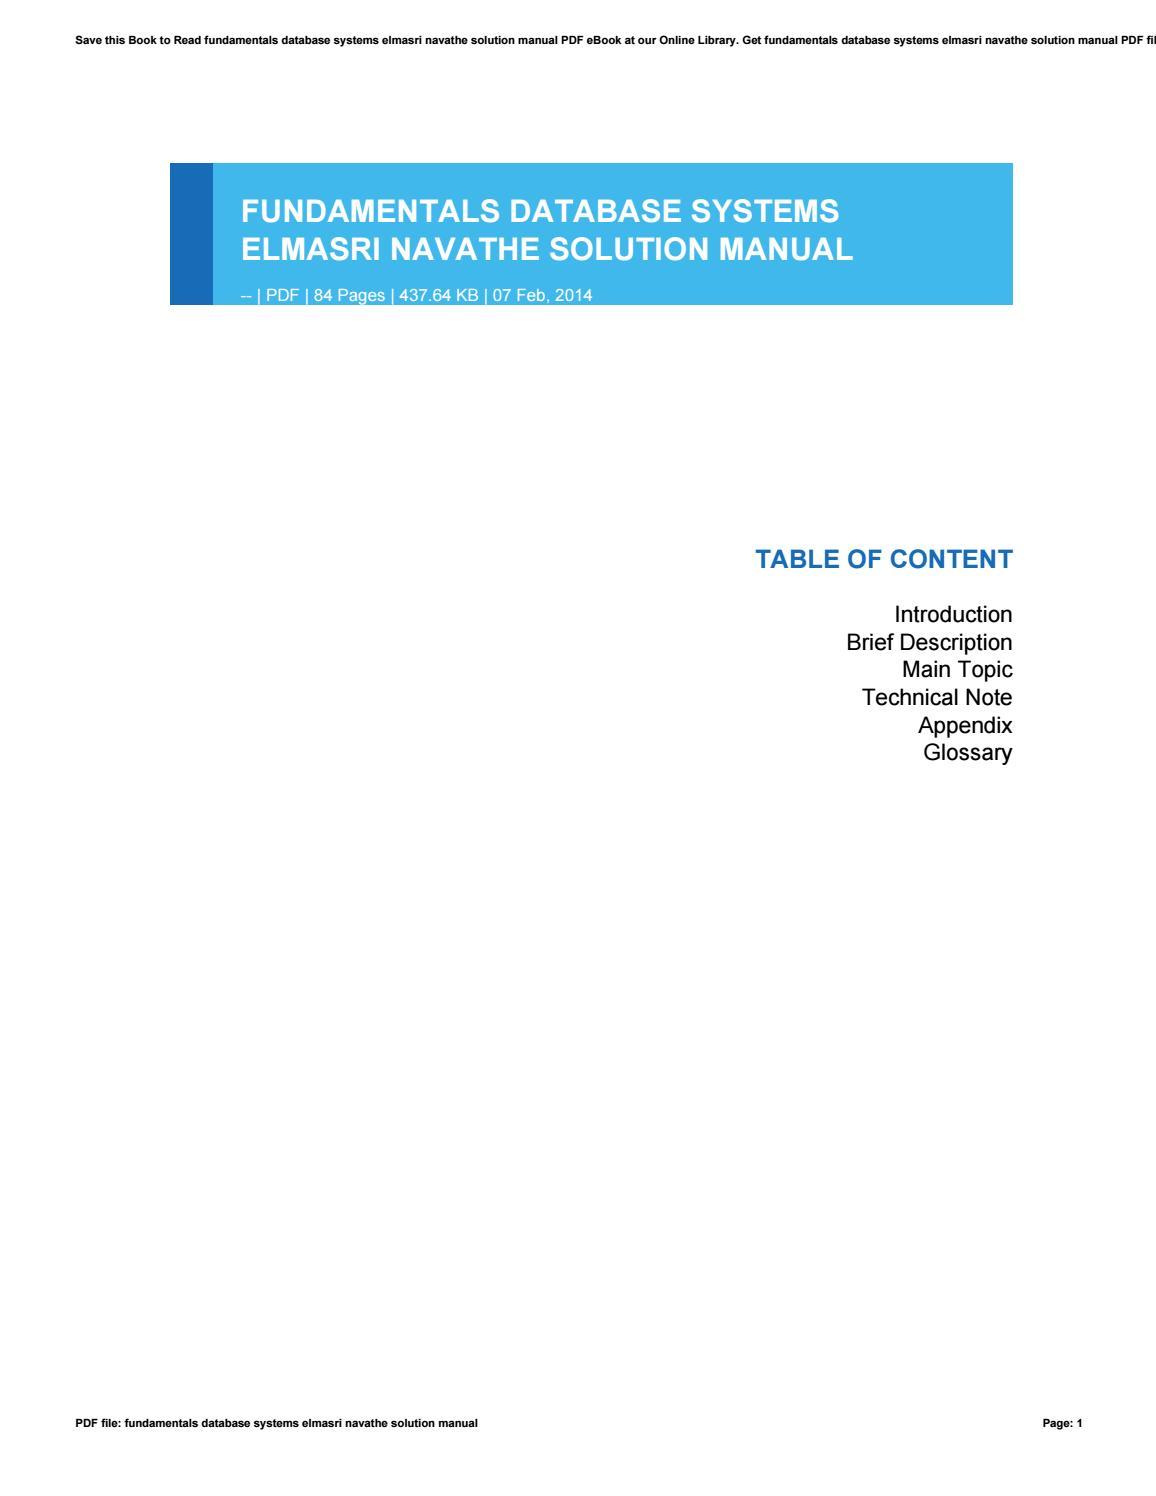 Fundamentals database systems elmasri navathe solution manual by asm96 -  issuu